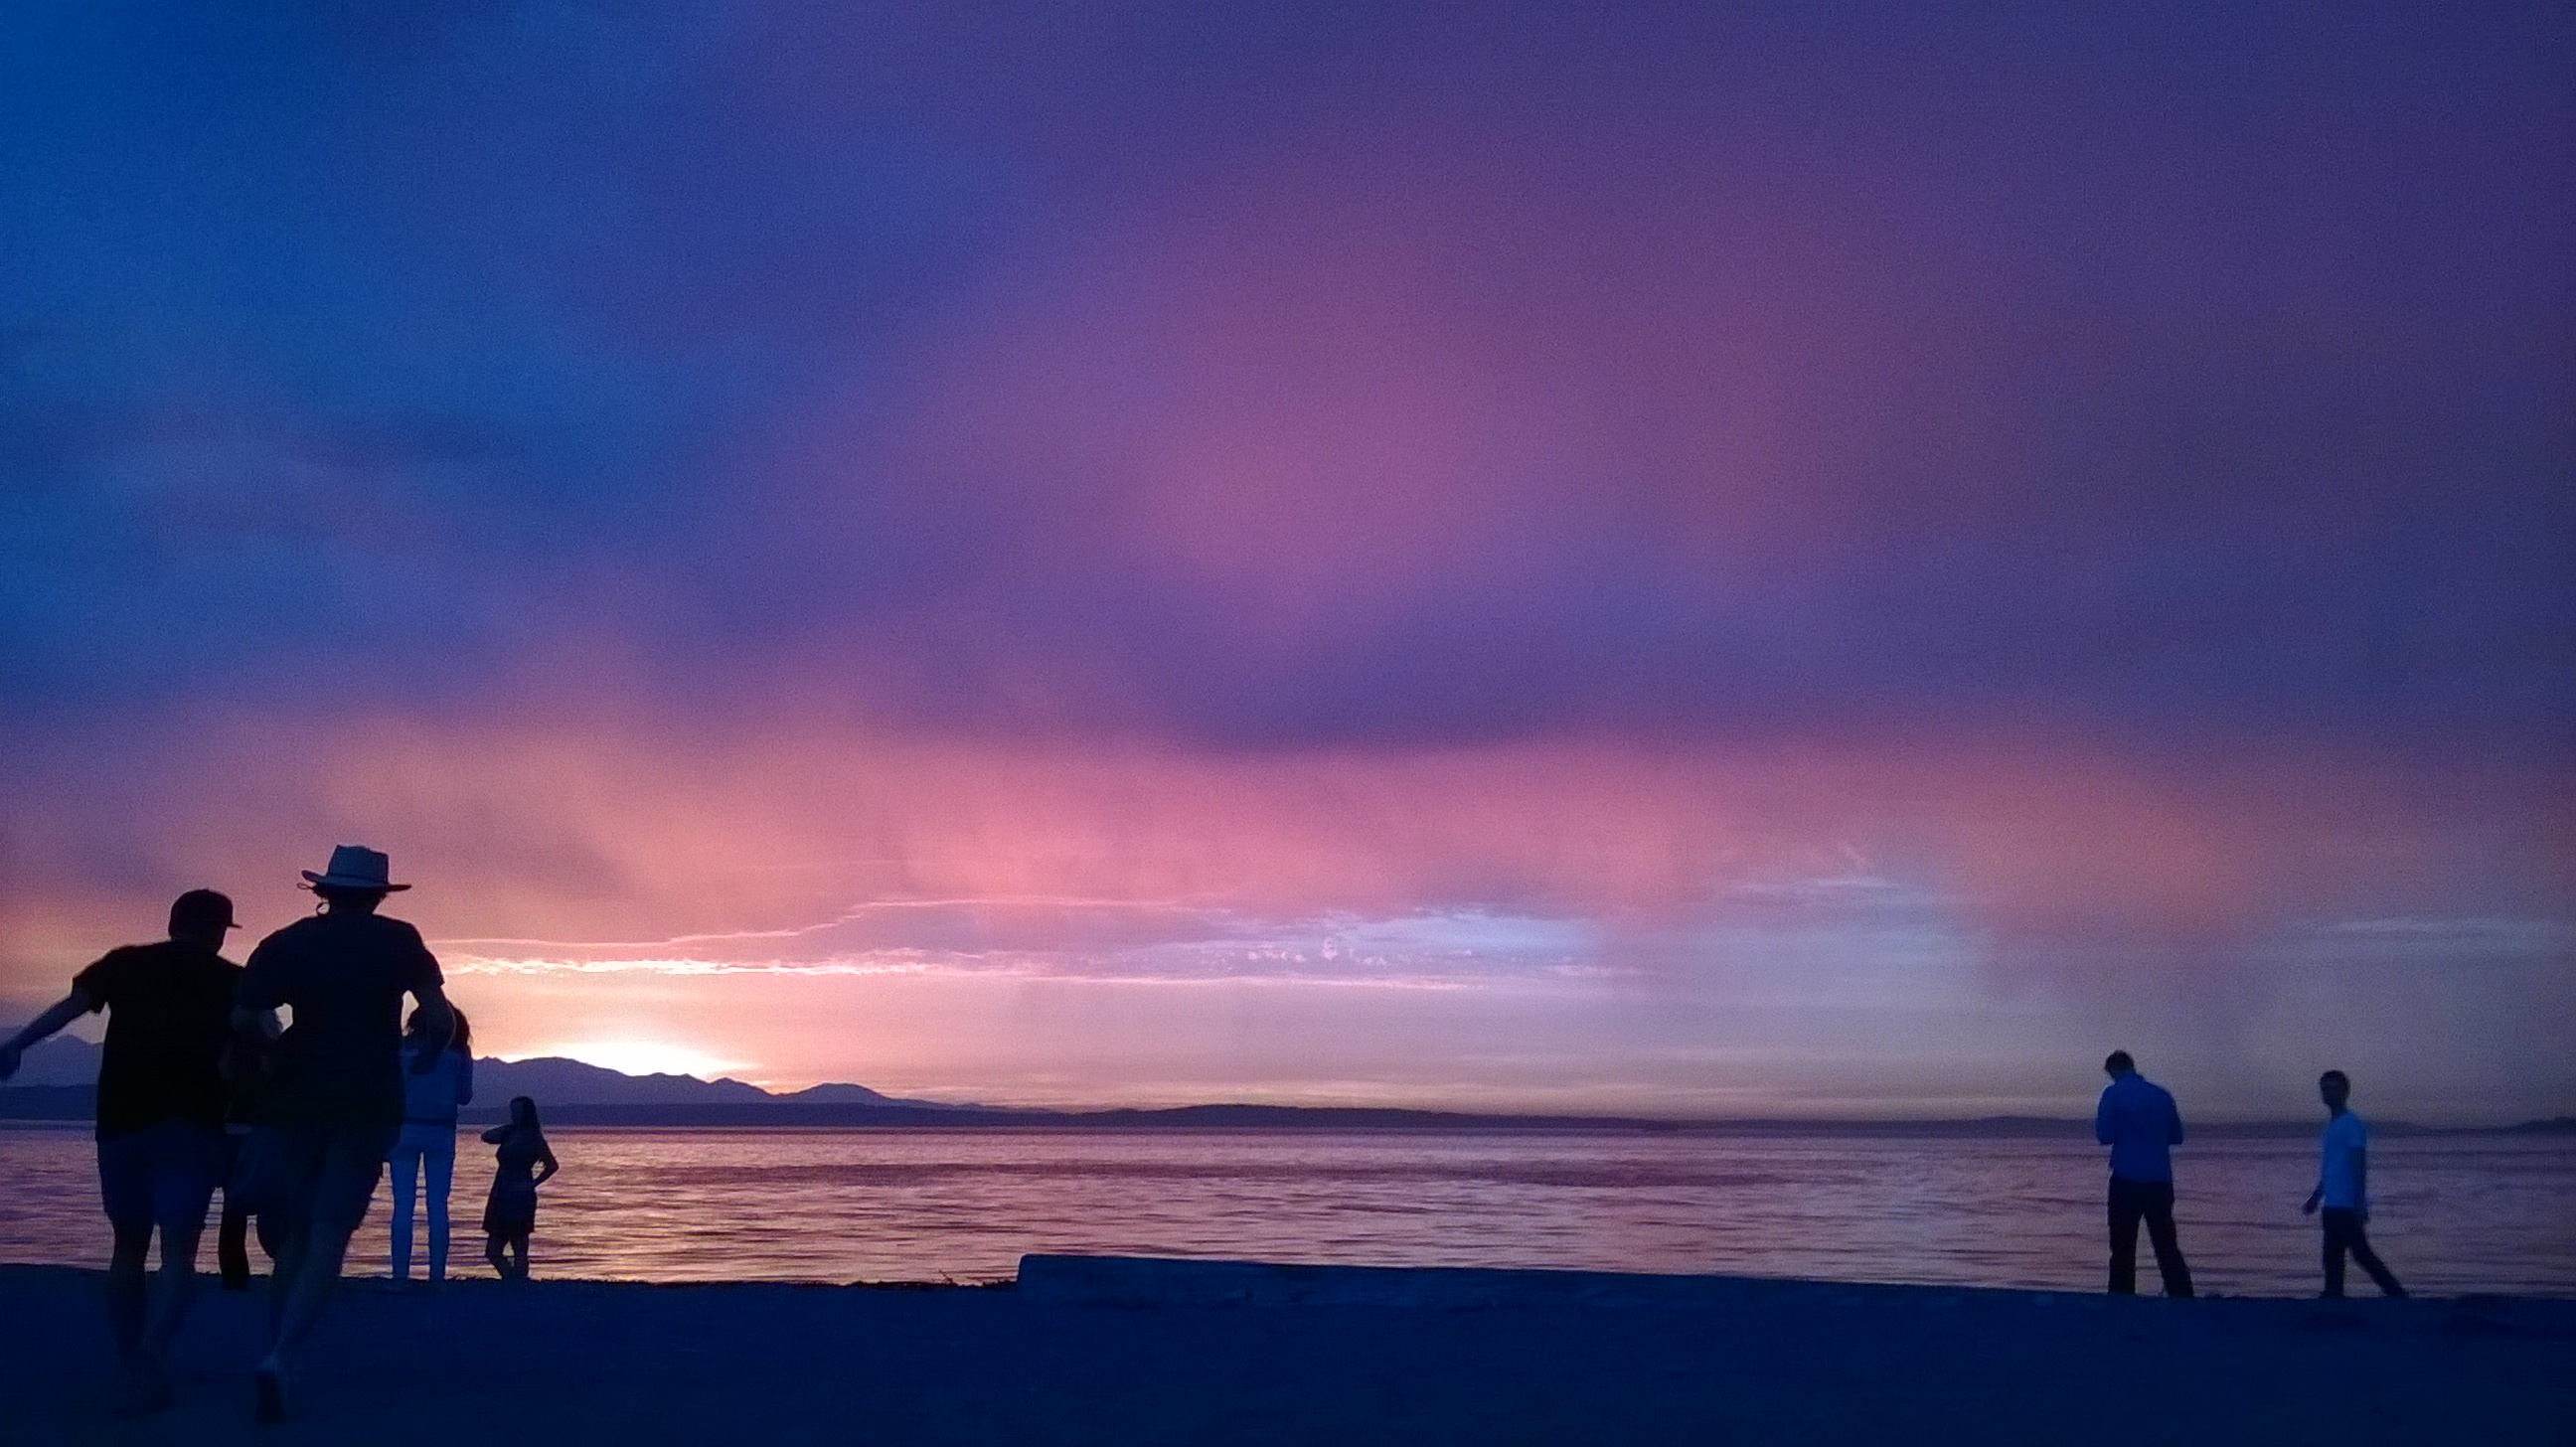 edmonds-beach.jpg